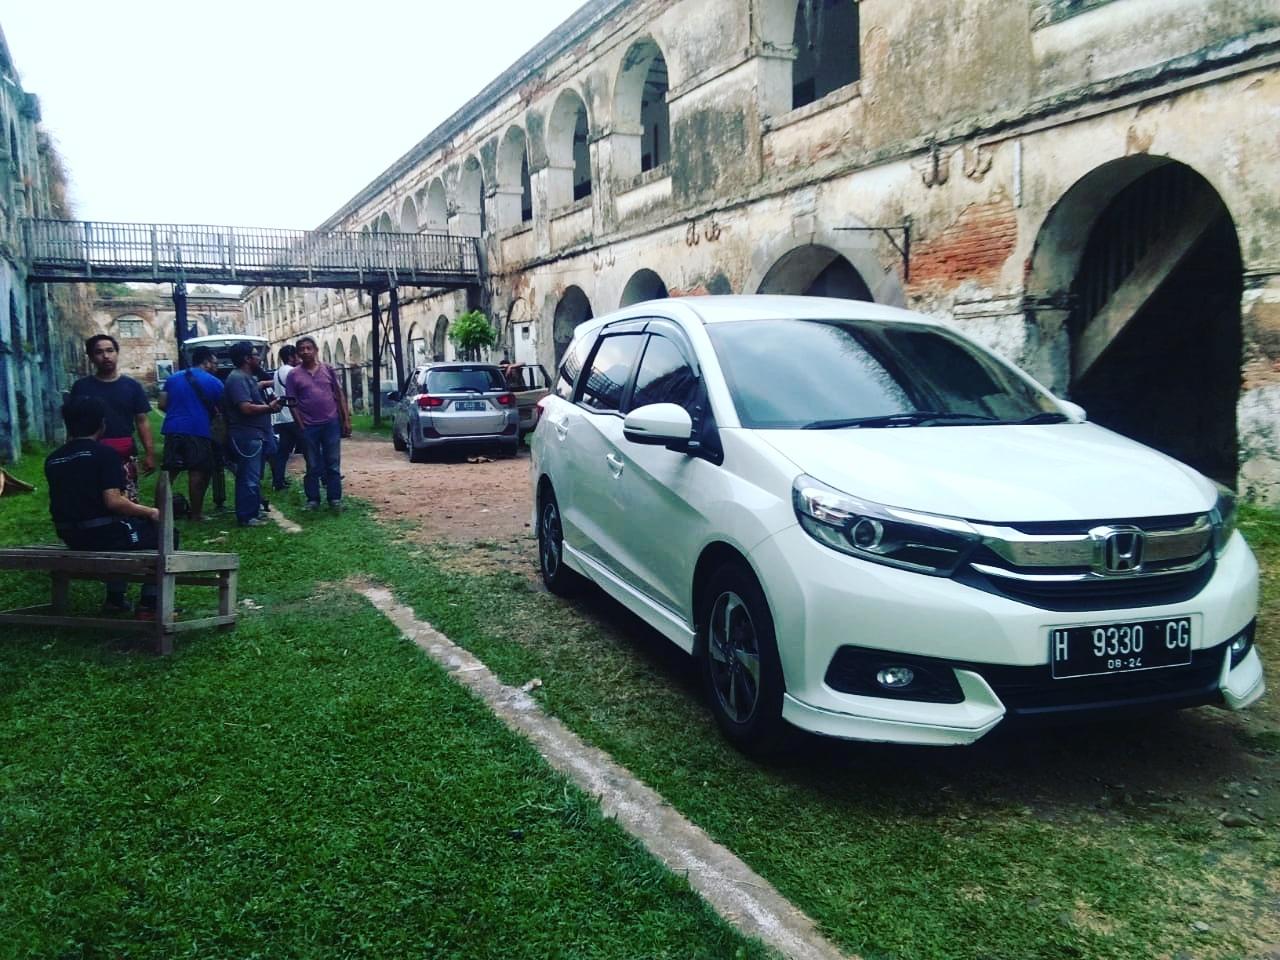 Rental Mobil Sekarang - Cari Sewa Mobil Semarang Kini Semakin Mudah